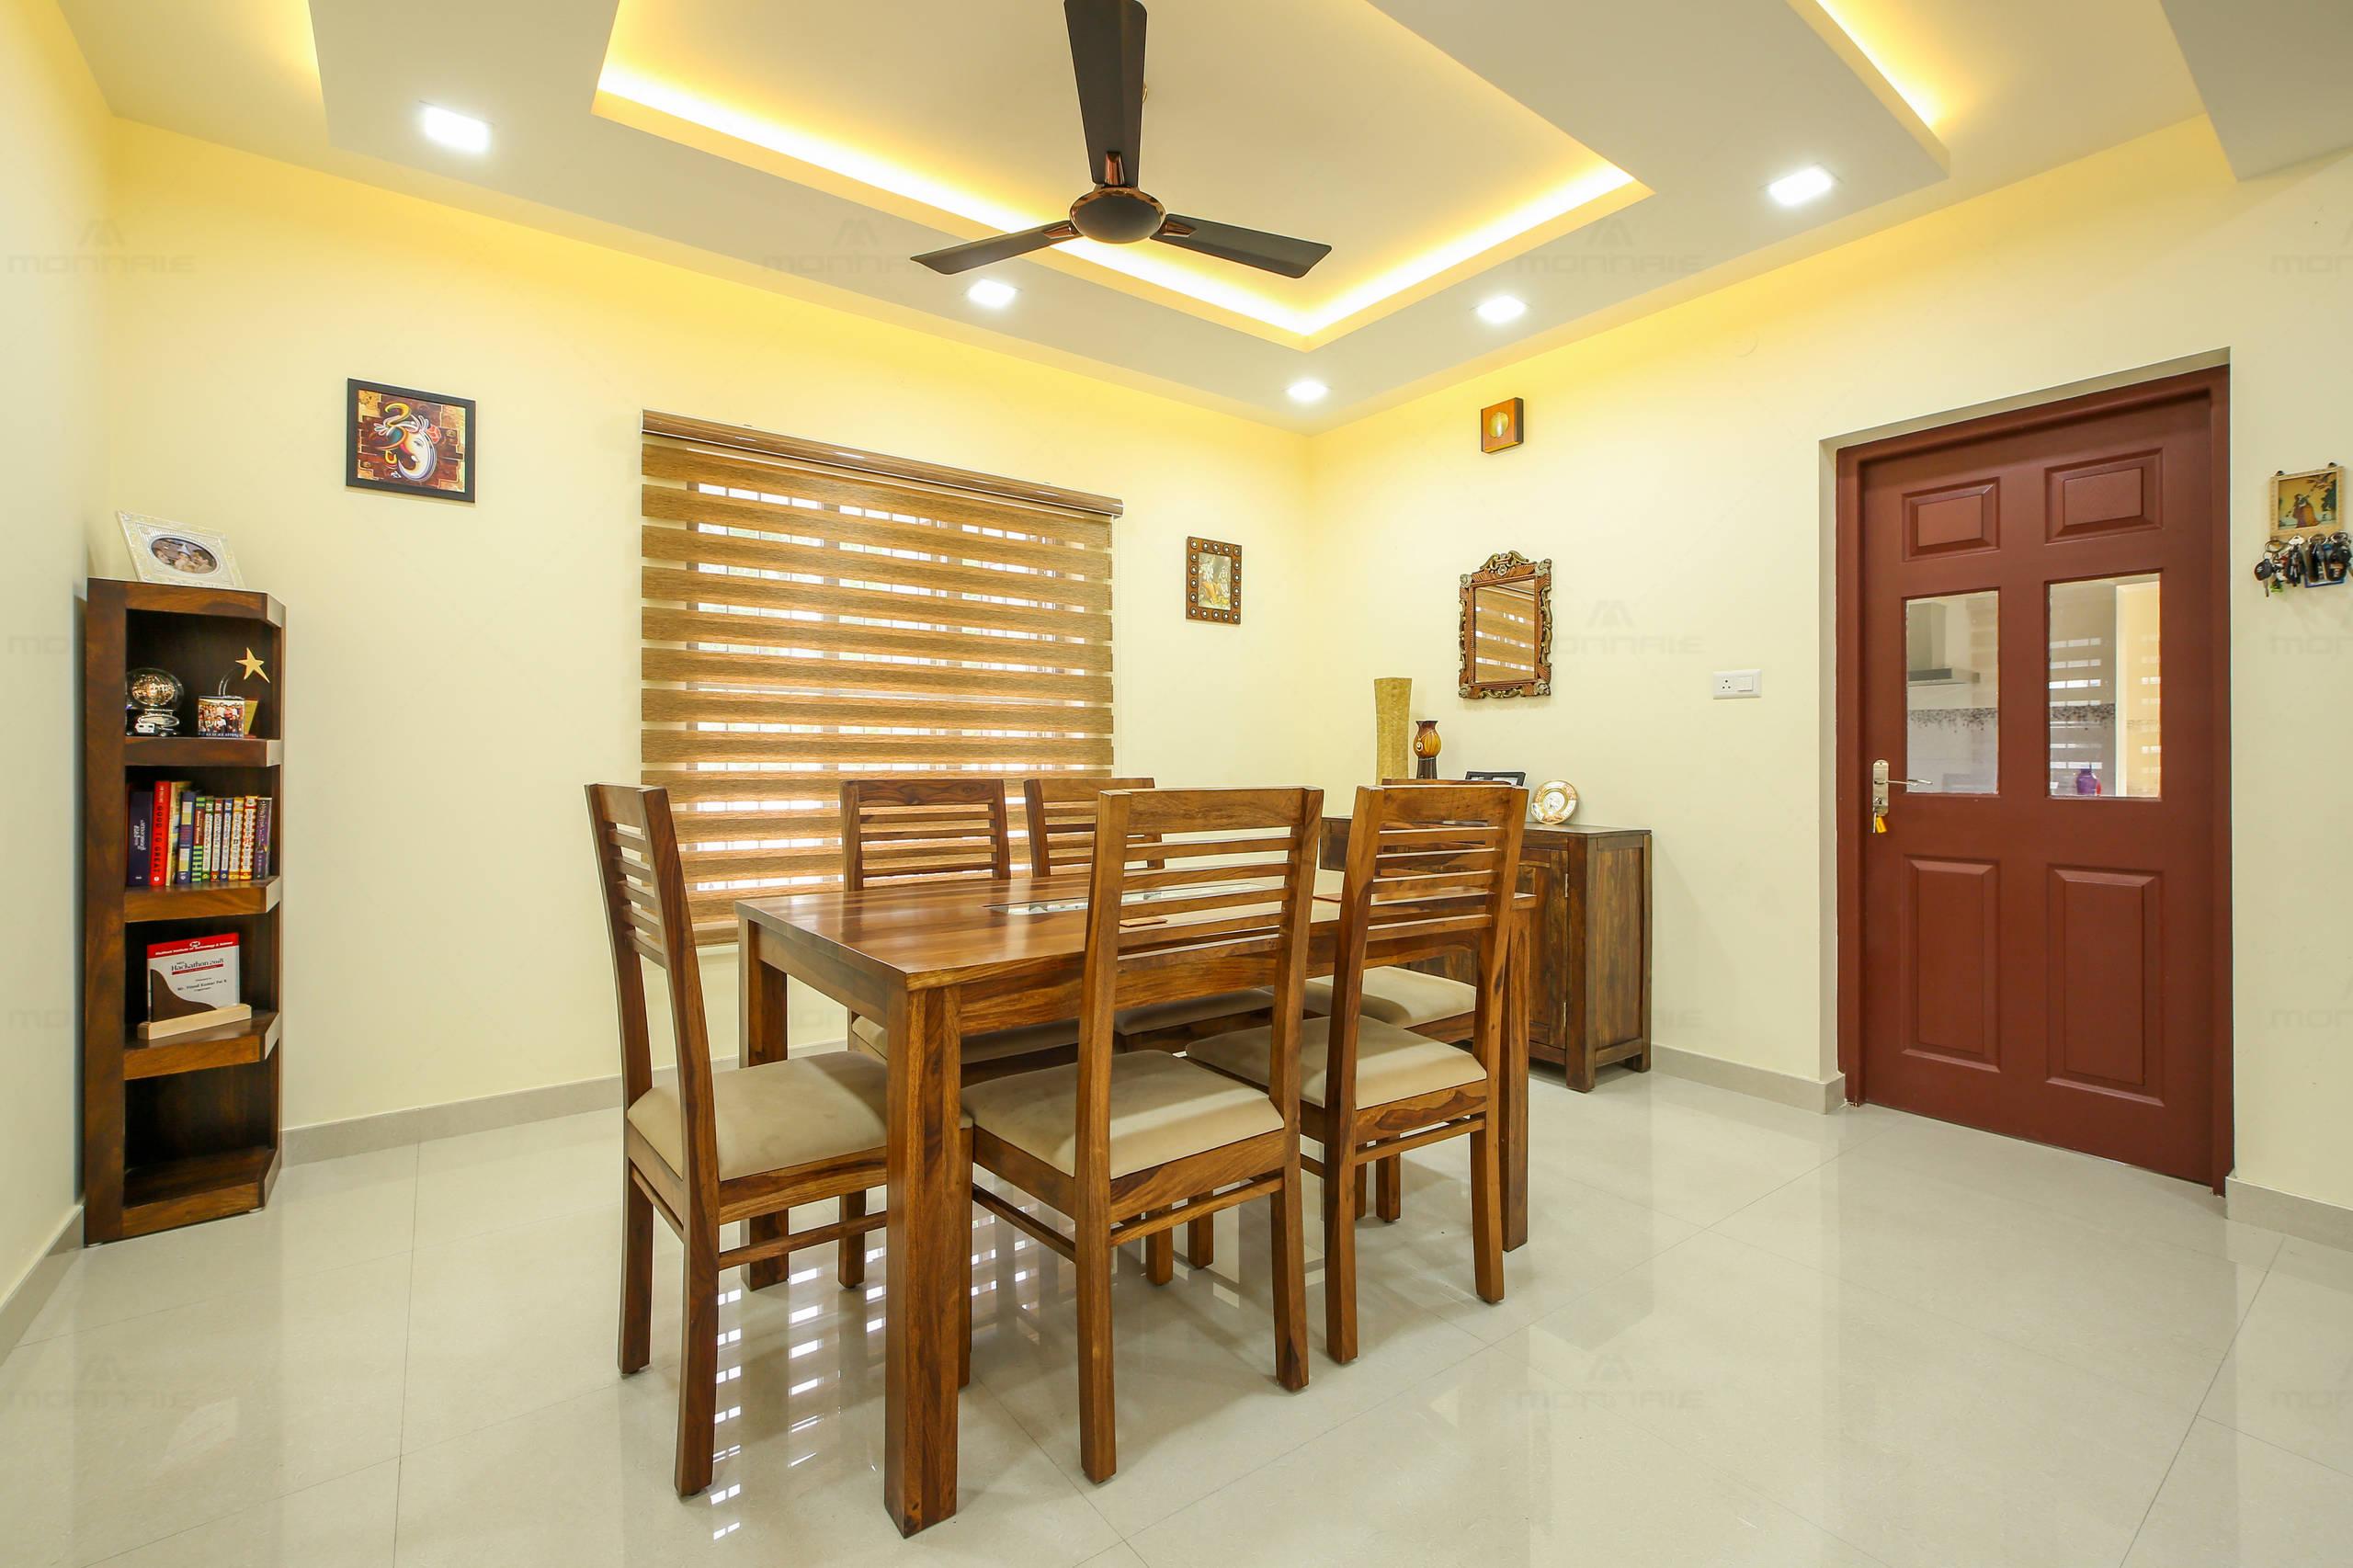 Kerala Dining Room Ideas & Photos  Houzz